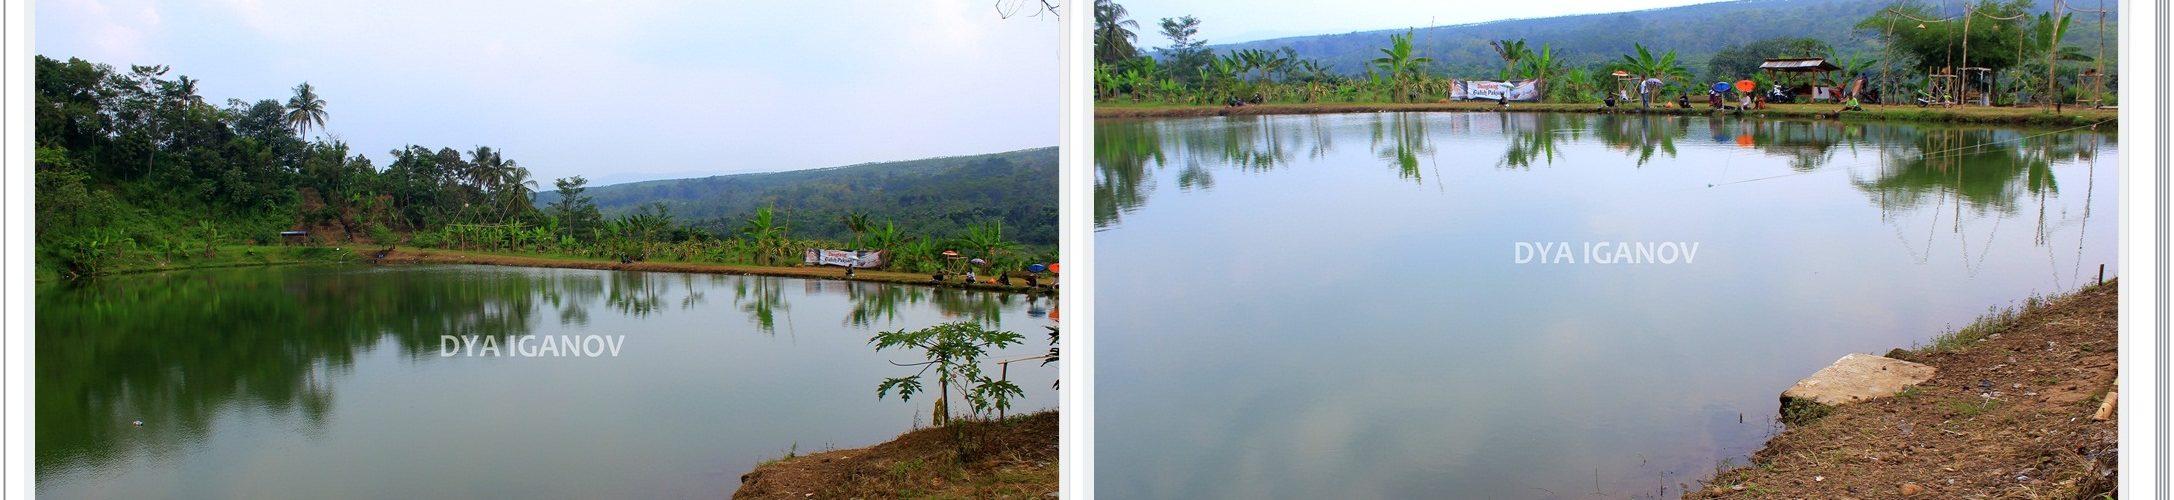 Desa Cisampih, Kecamatan Dawuan, Kabupaten Subang, Jawa Barat